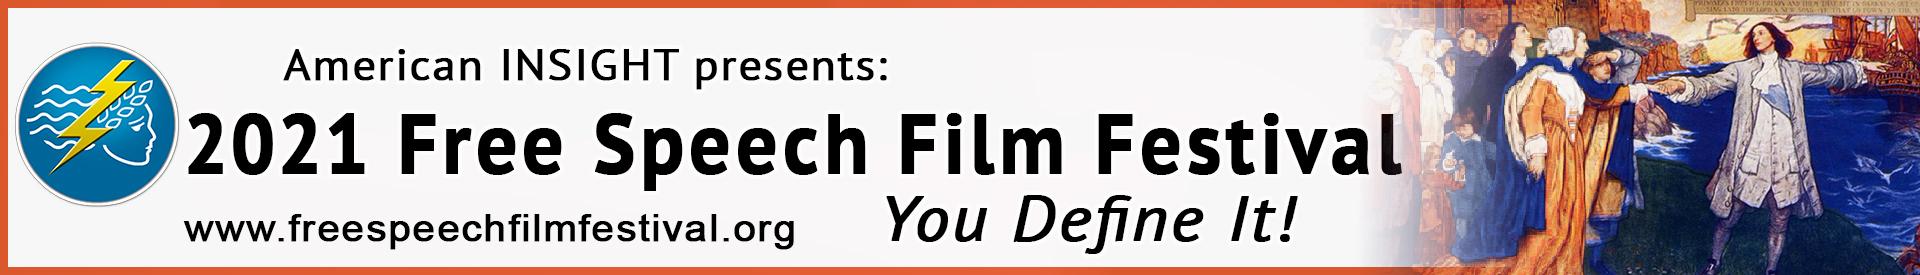 2021 Free Speech Film Festival